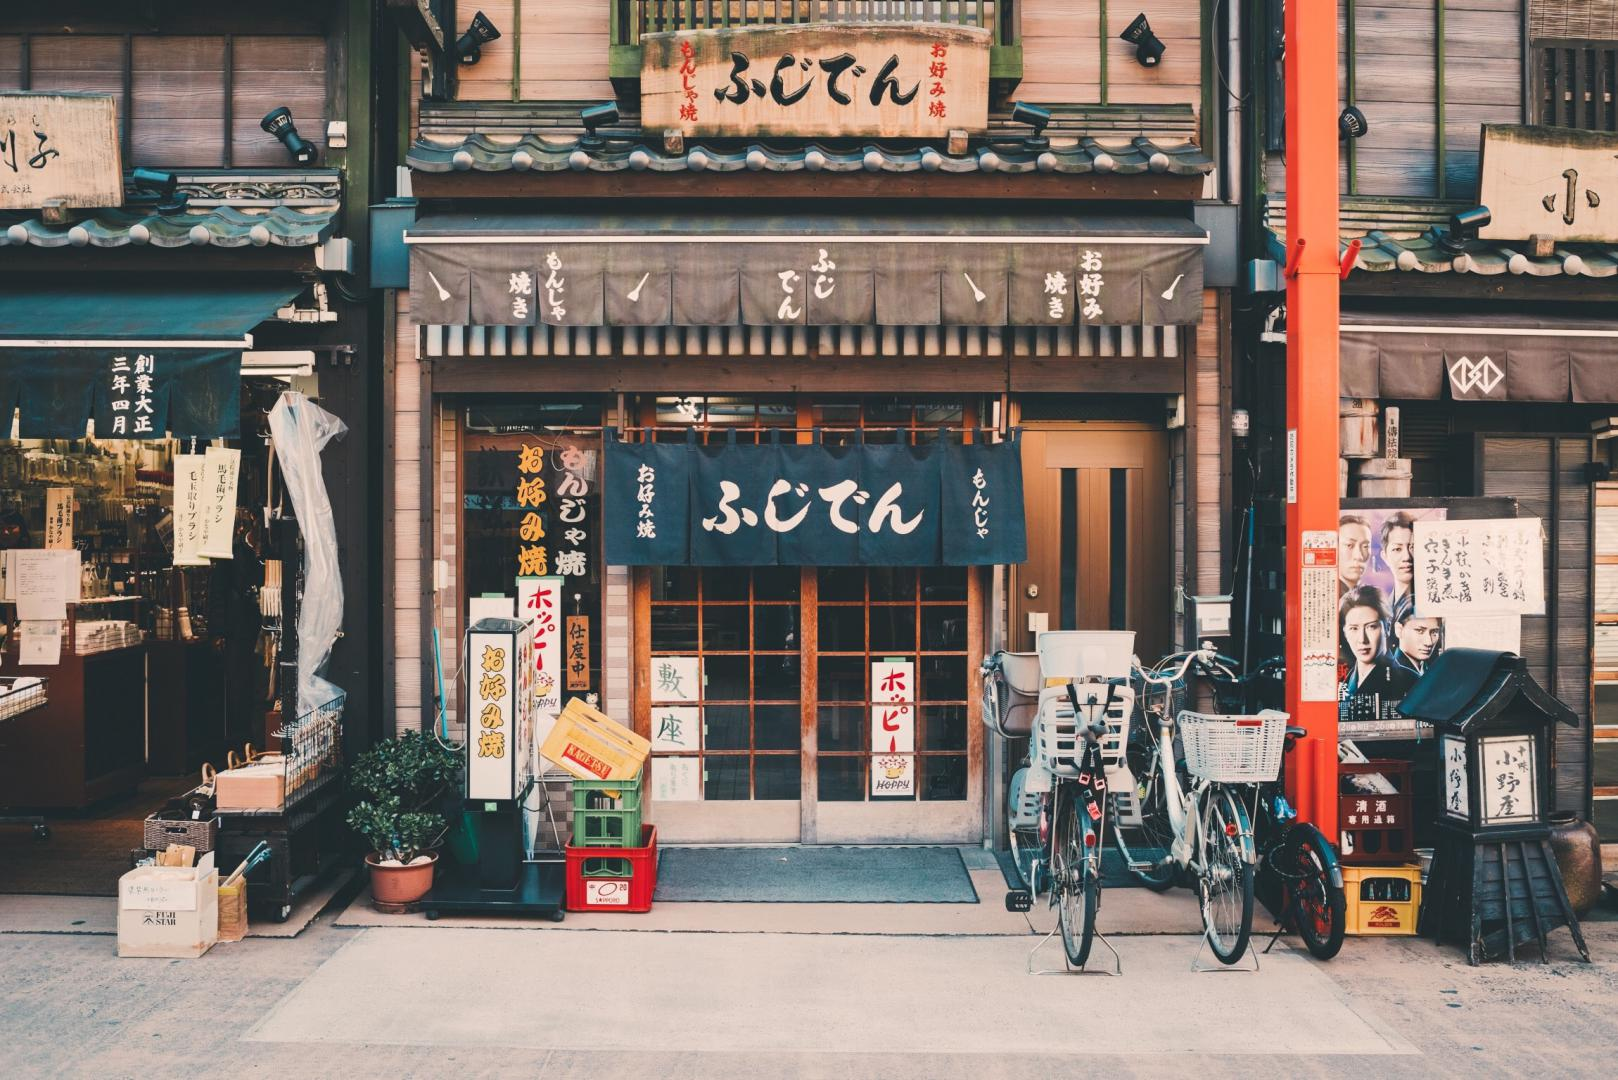 Japan Unsplash Photo by Clay Banks